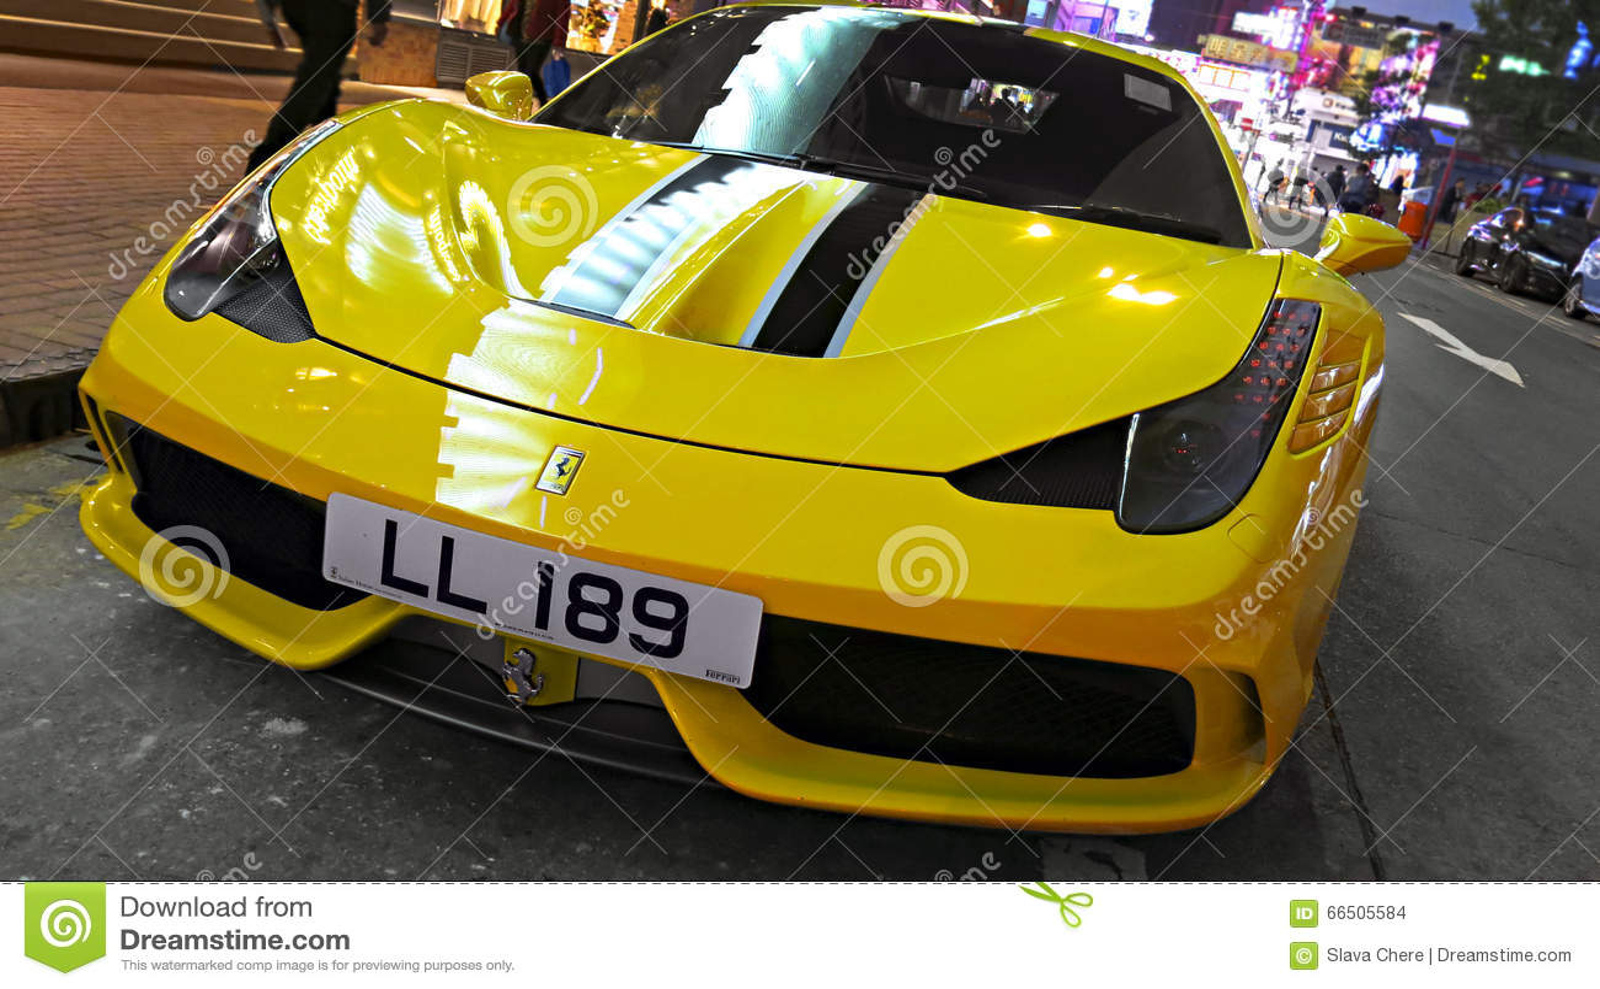 Sports Car Ferrari 458 Spider Editorial Stock Image Image Of Beautiful City 66505584